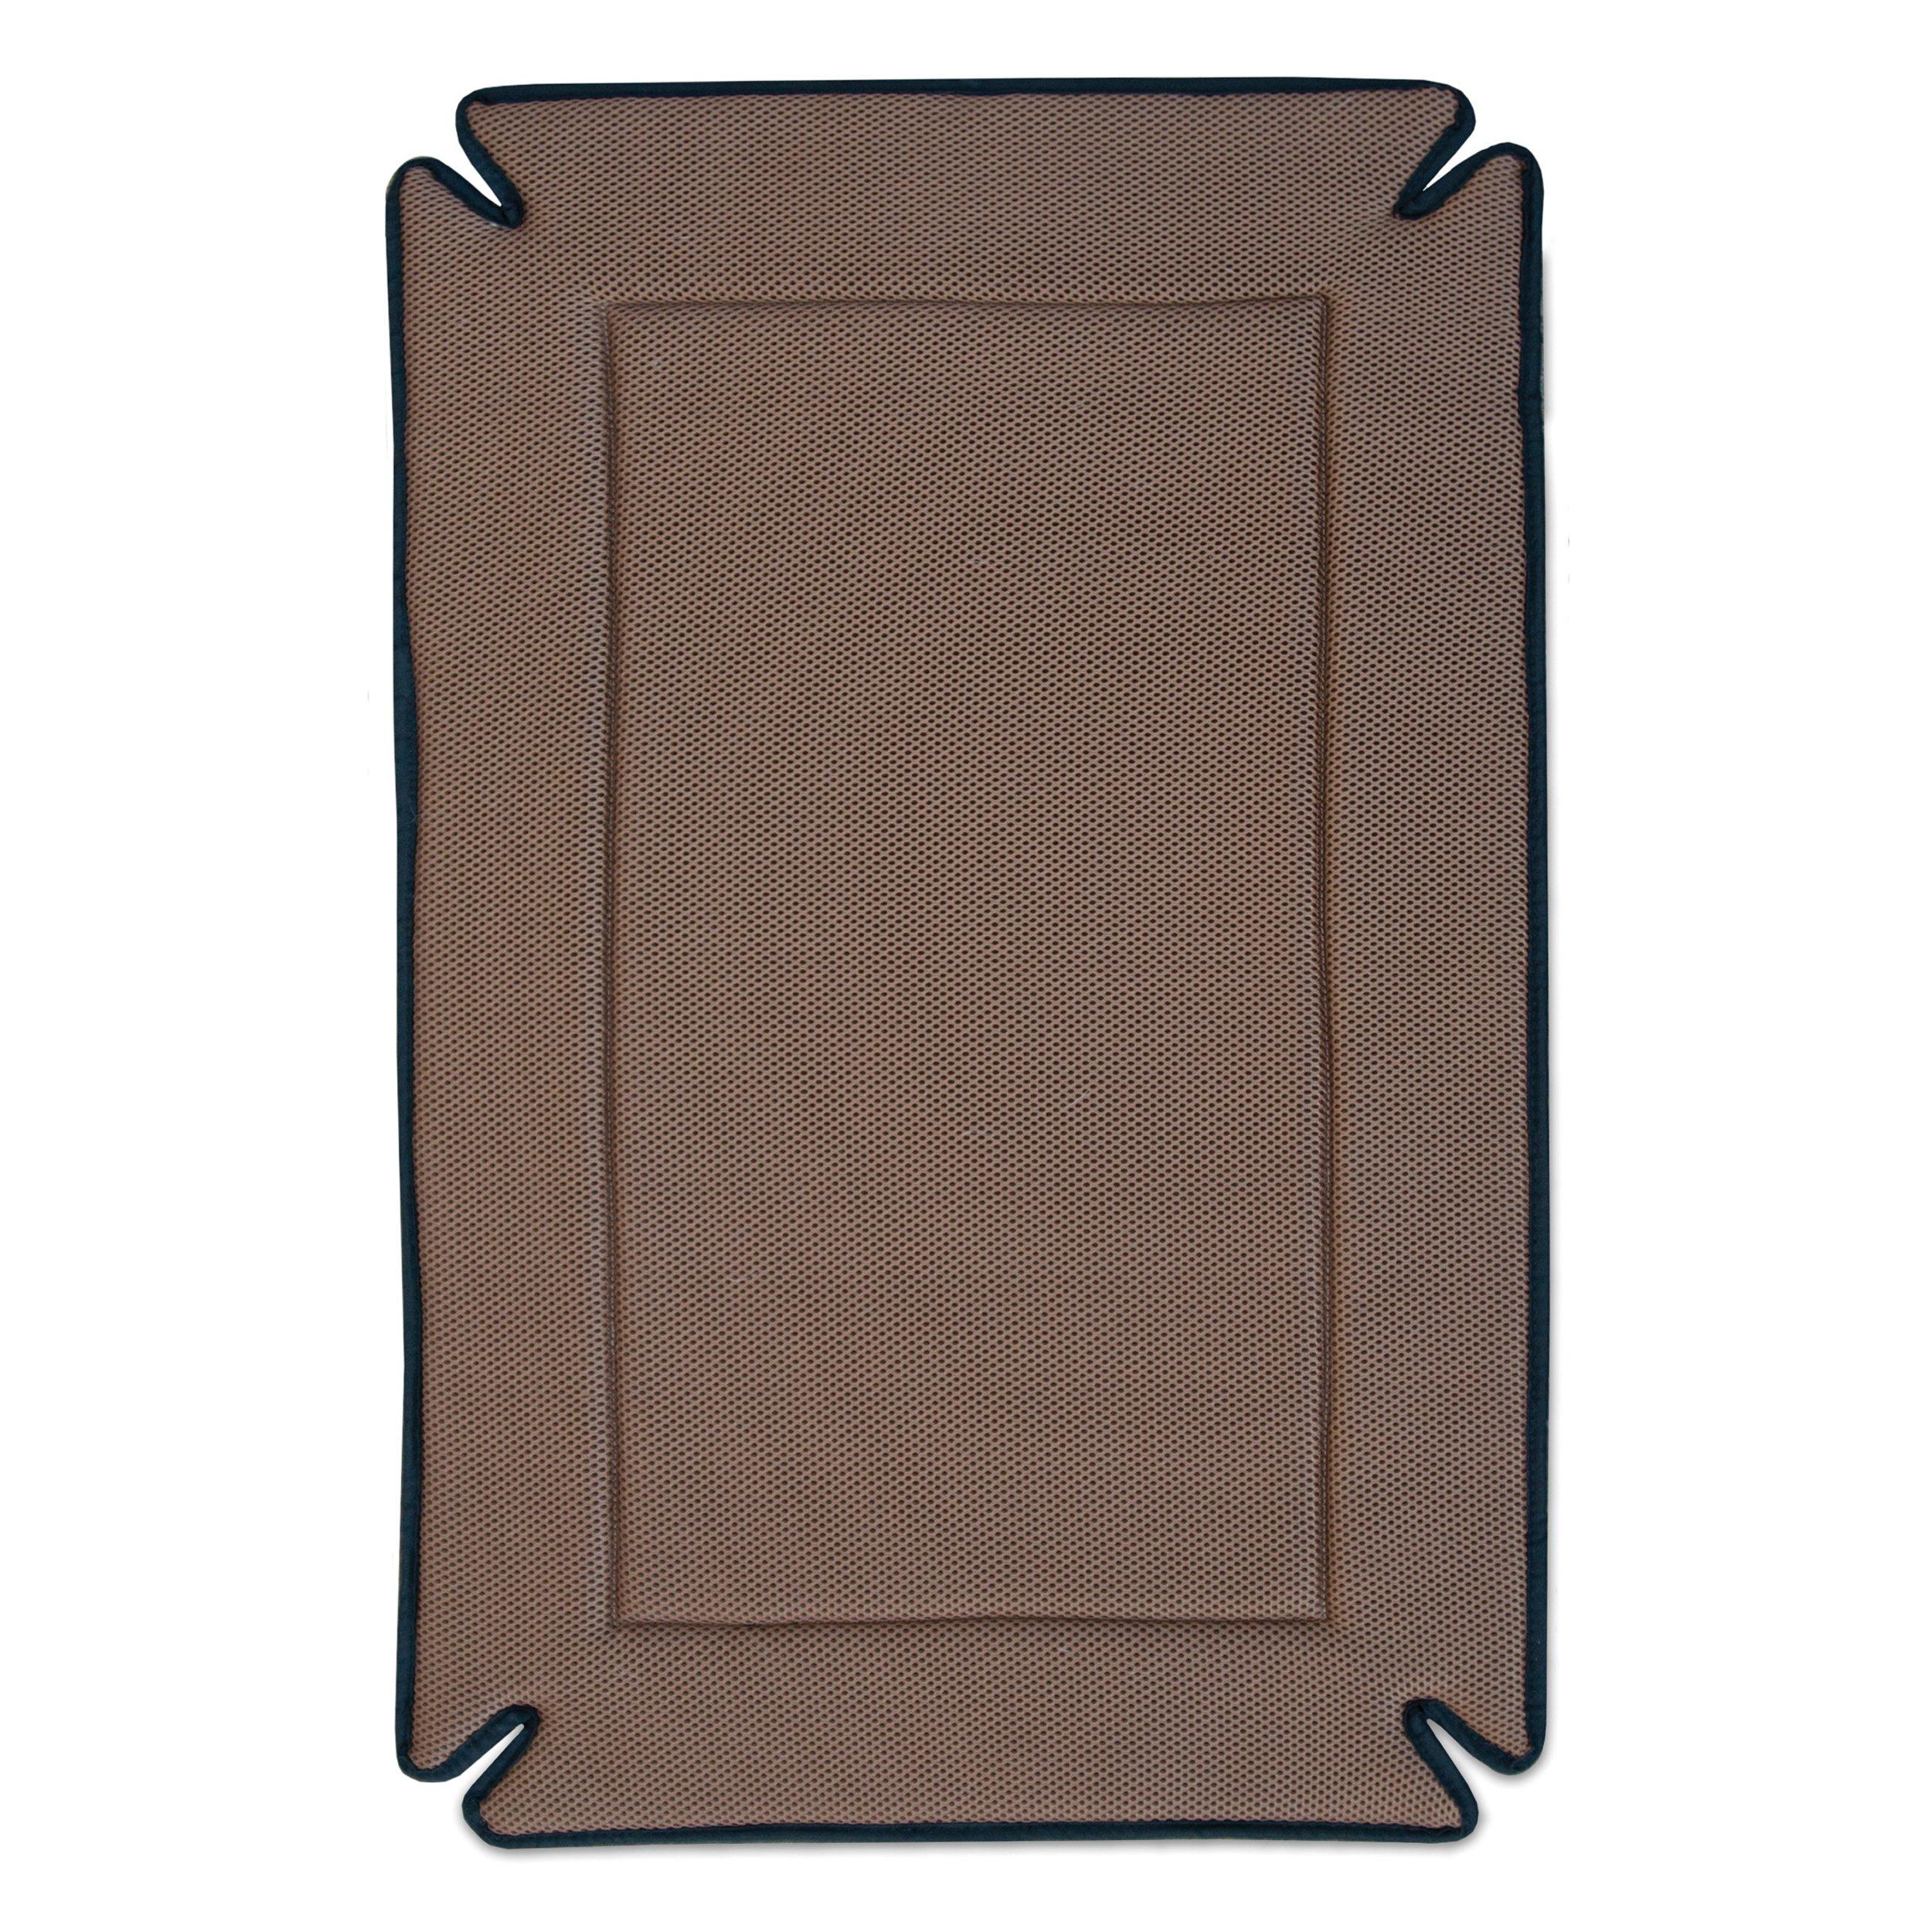 K&H Pet Products Odor-Control Crate Pad XX-Large Mocha 37'' x 54''